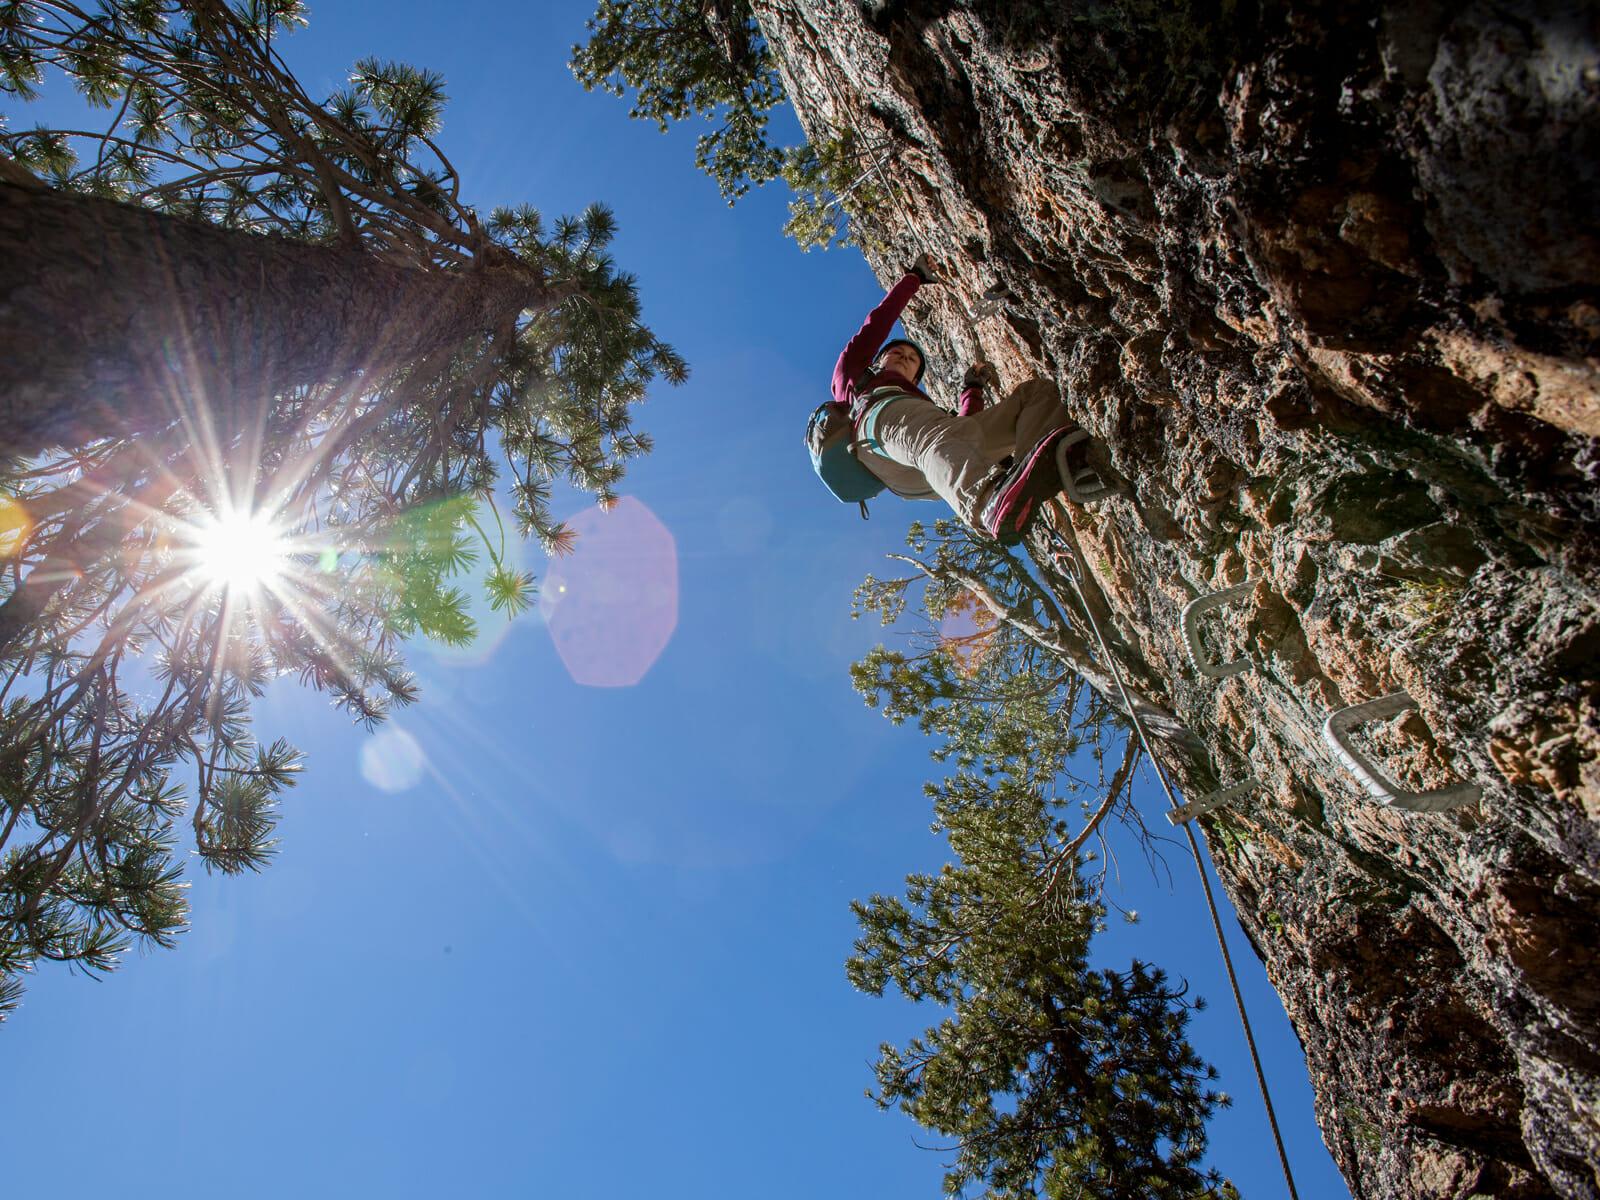 Klettersteig La Resgia : Klettersteige la resgia bergsteigerschule pontresina